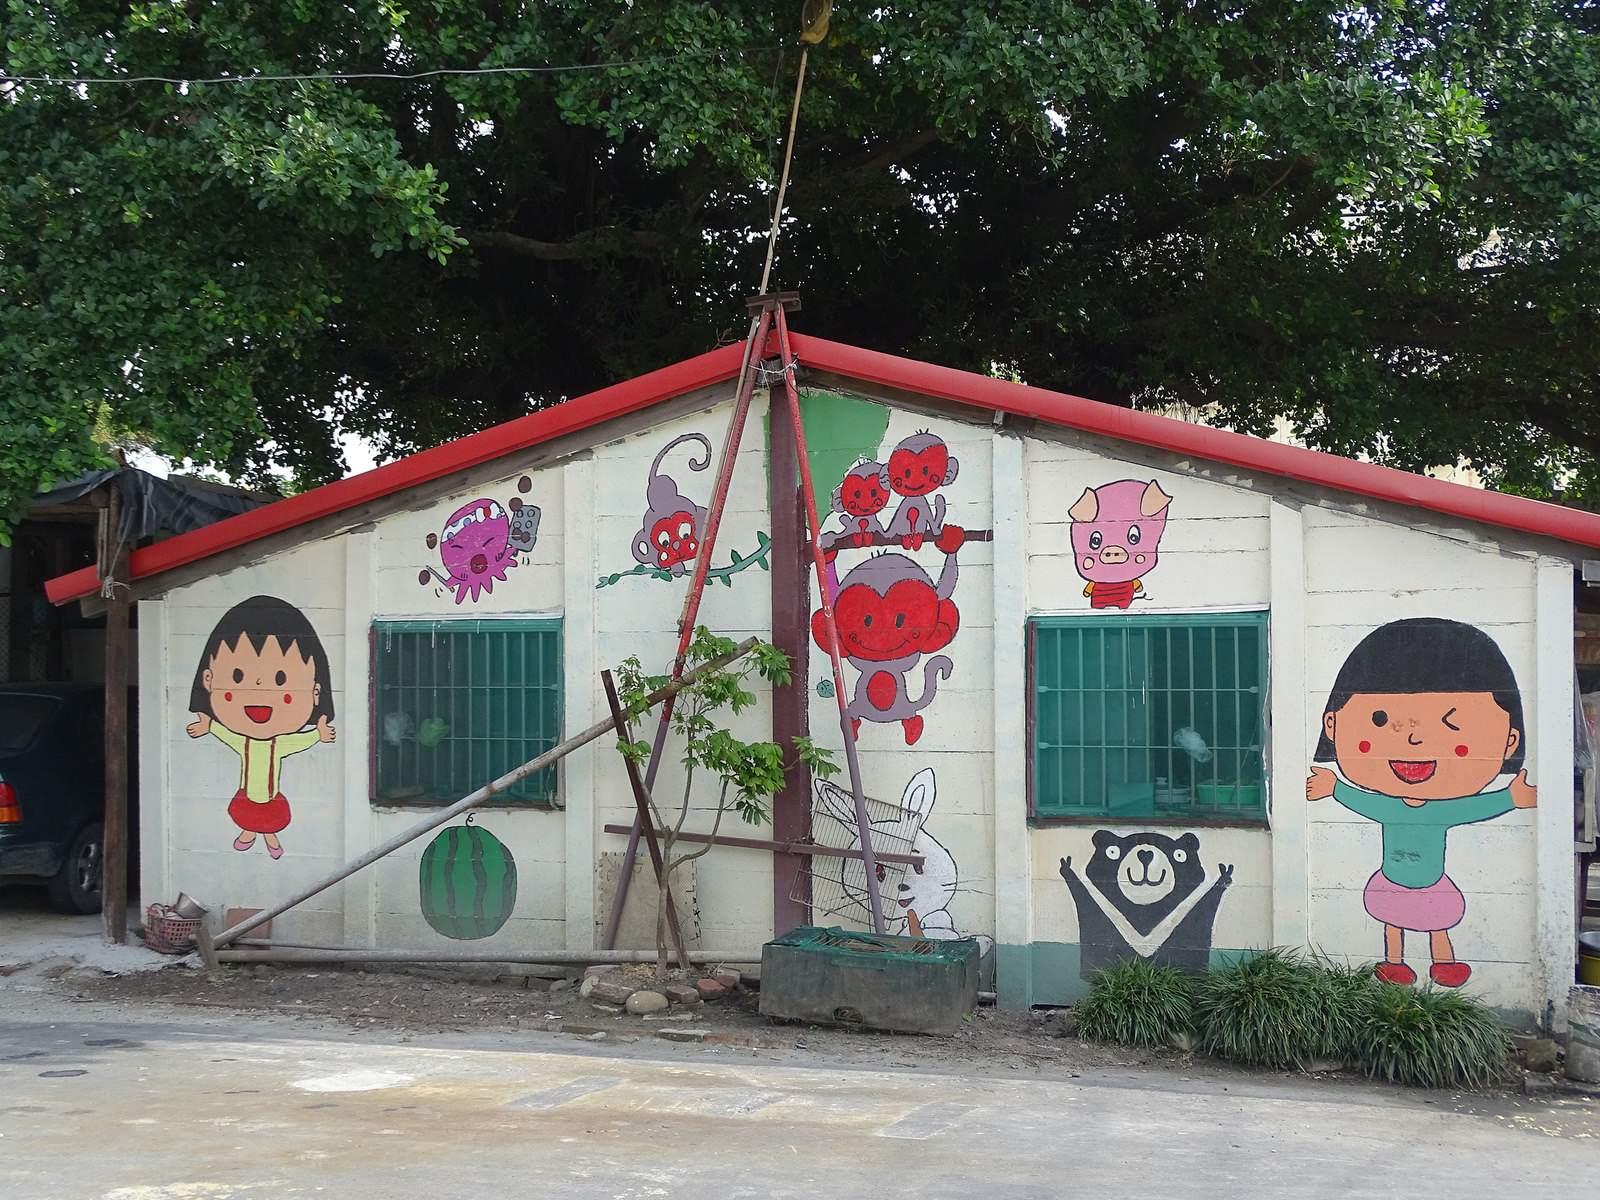 painted village12 Painted Fubao Village in Changhua